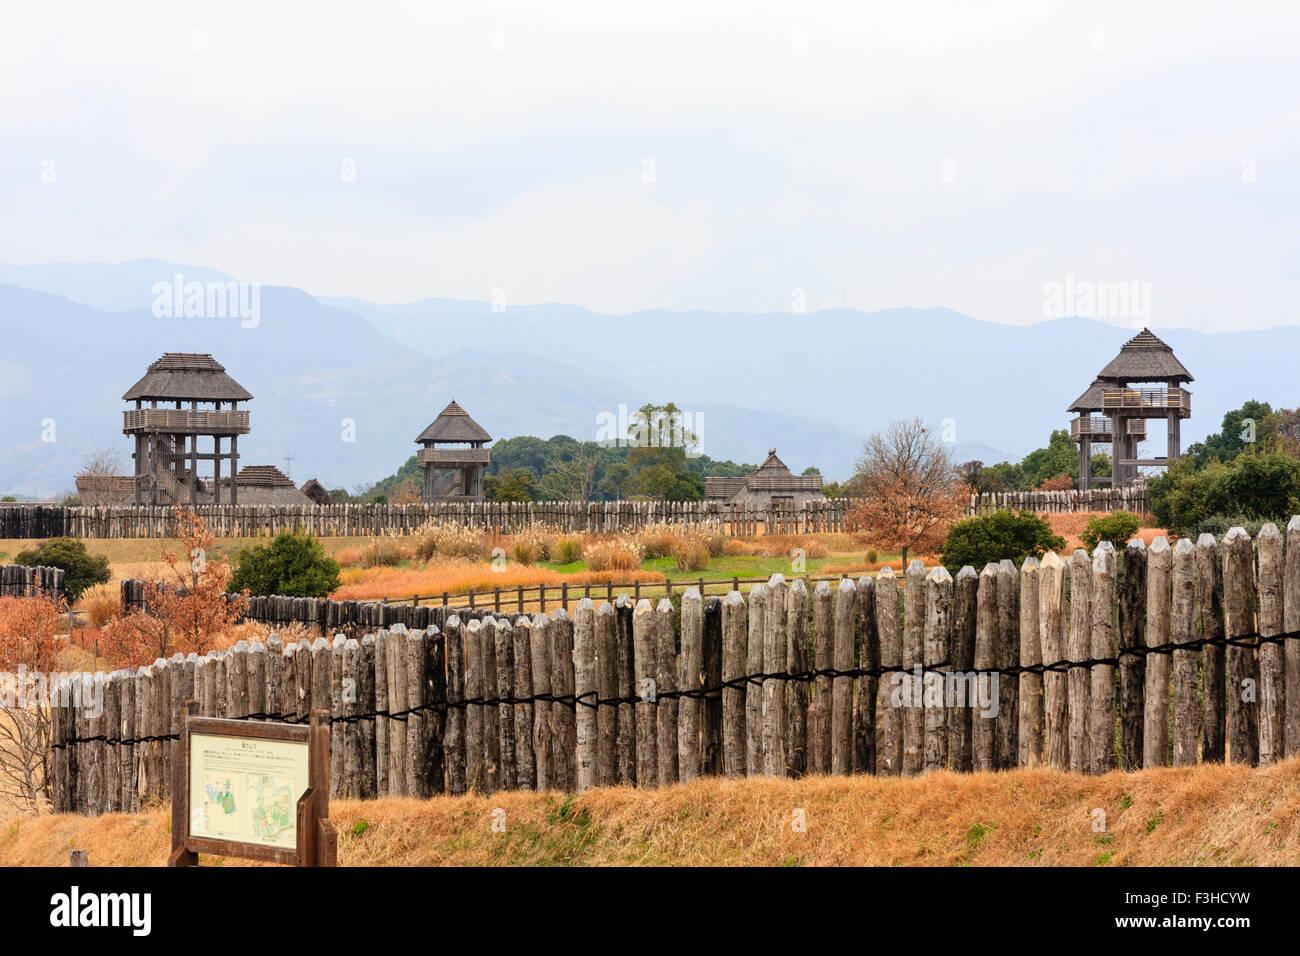 Yoshinogari Park. Yayoi settlement. Minaminaikaku, rulers area. Watchtowers - Stock Image